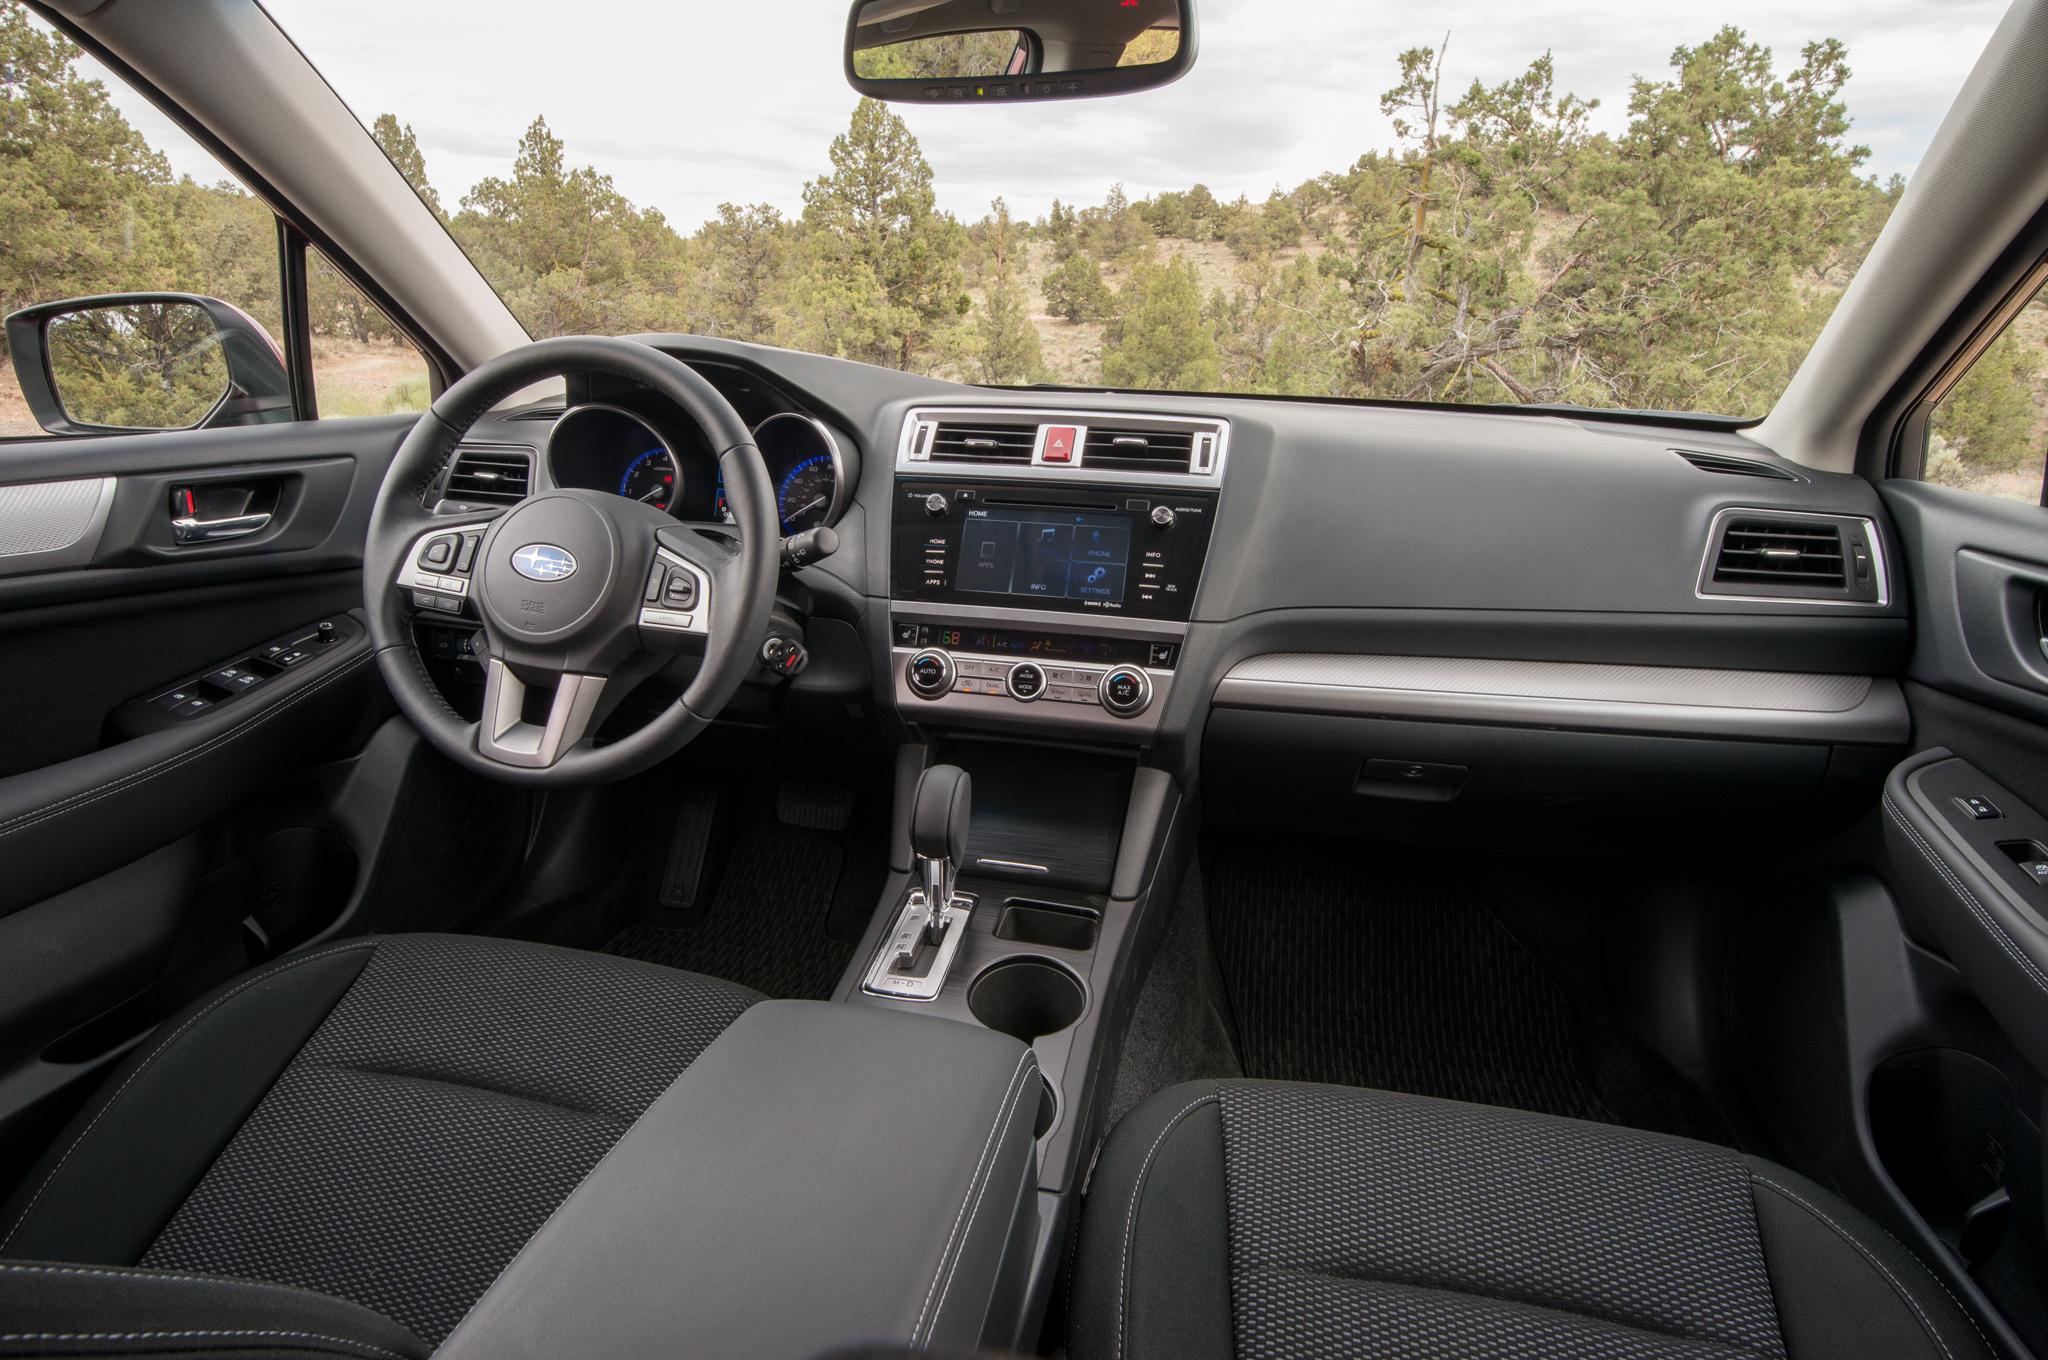 2015 Subaru Outback Interior Dashboard and Cockpit